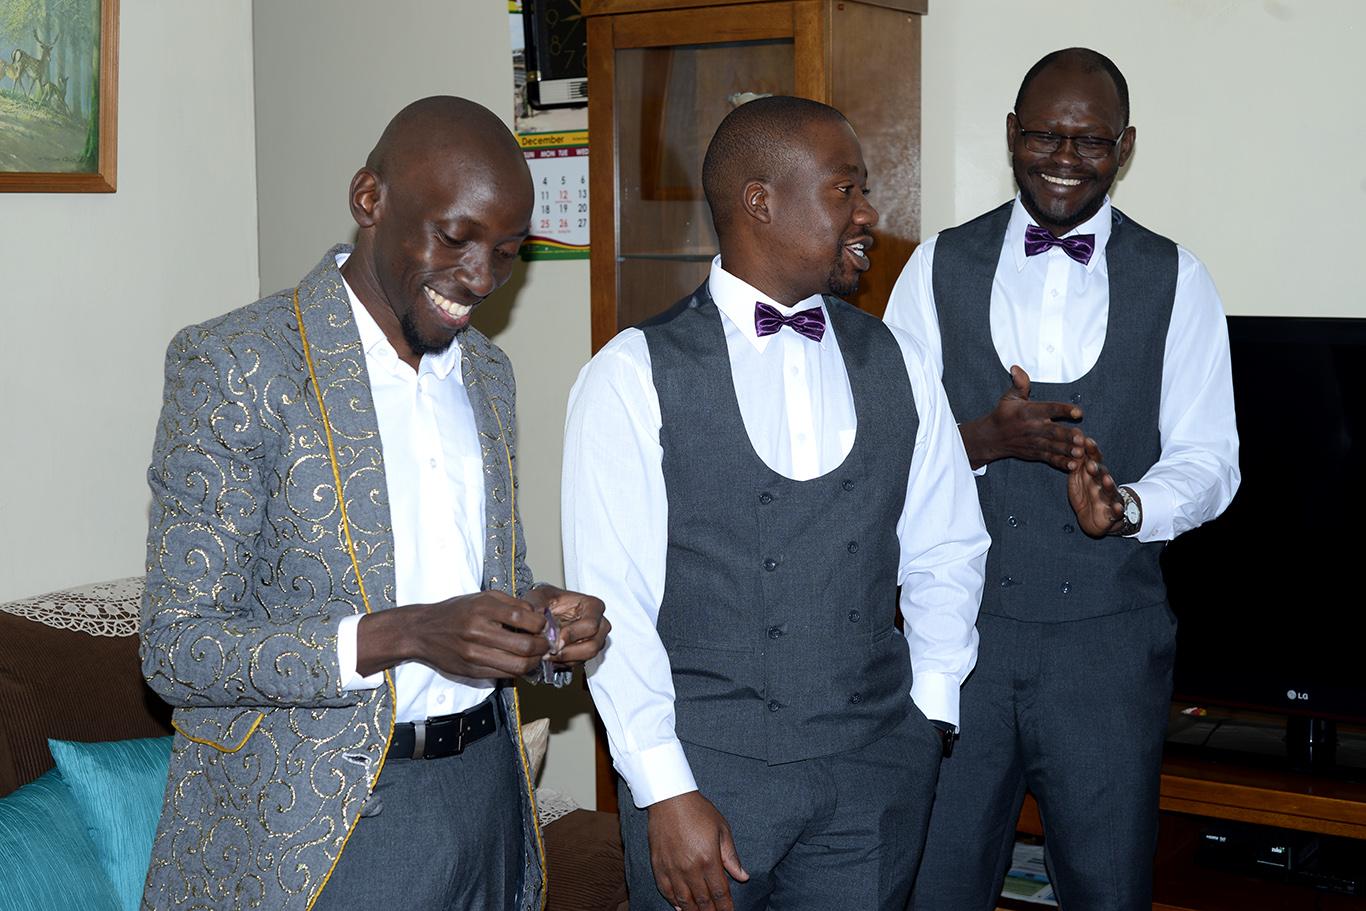 wedding jacket for the groom kenya